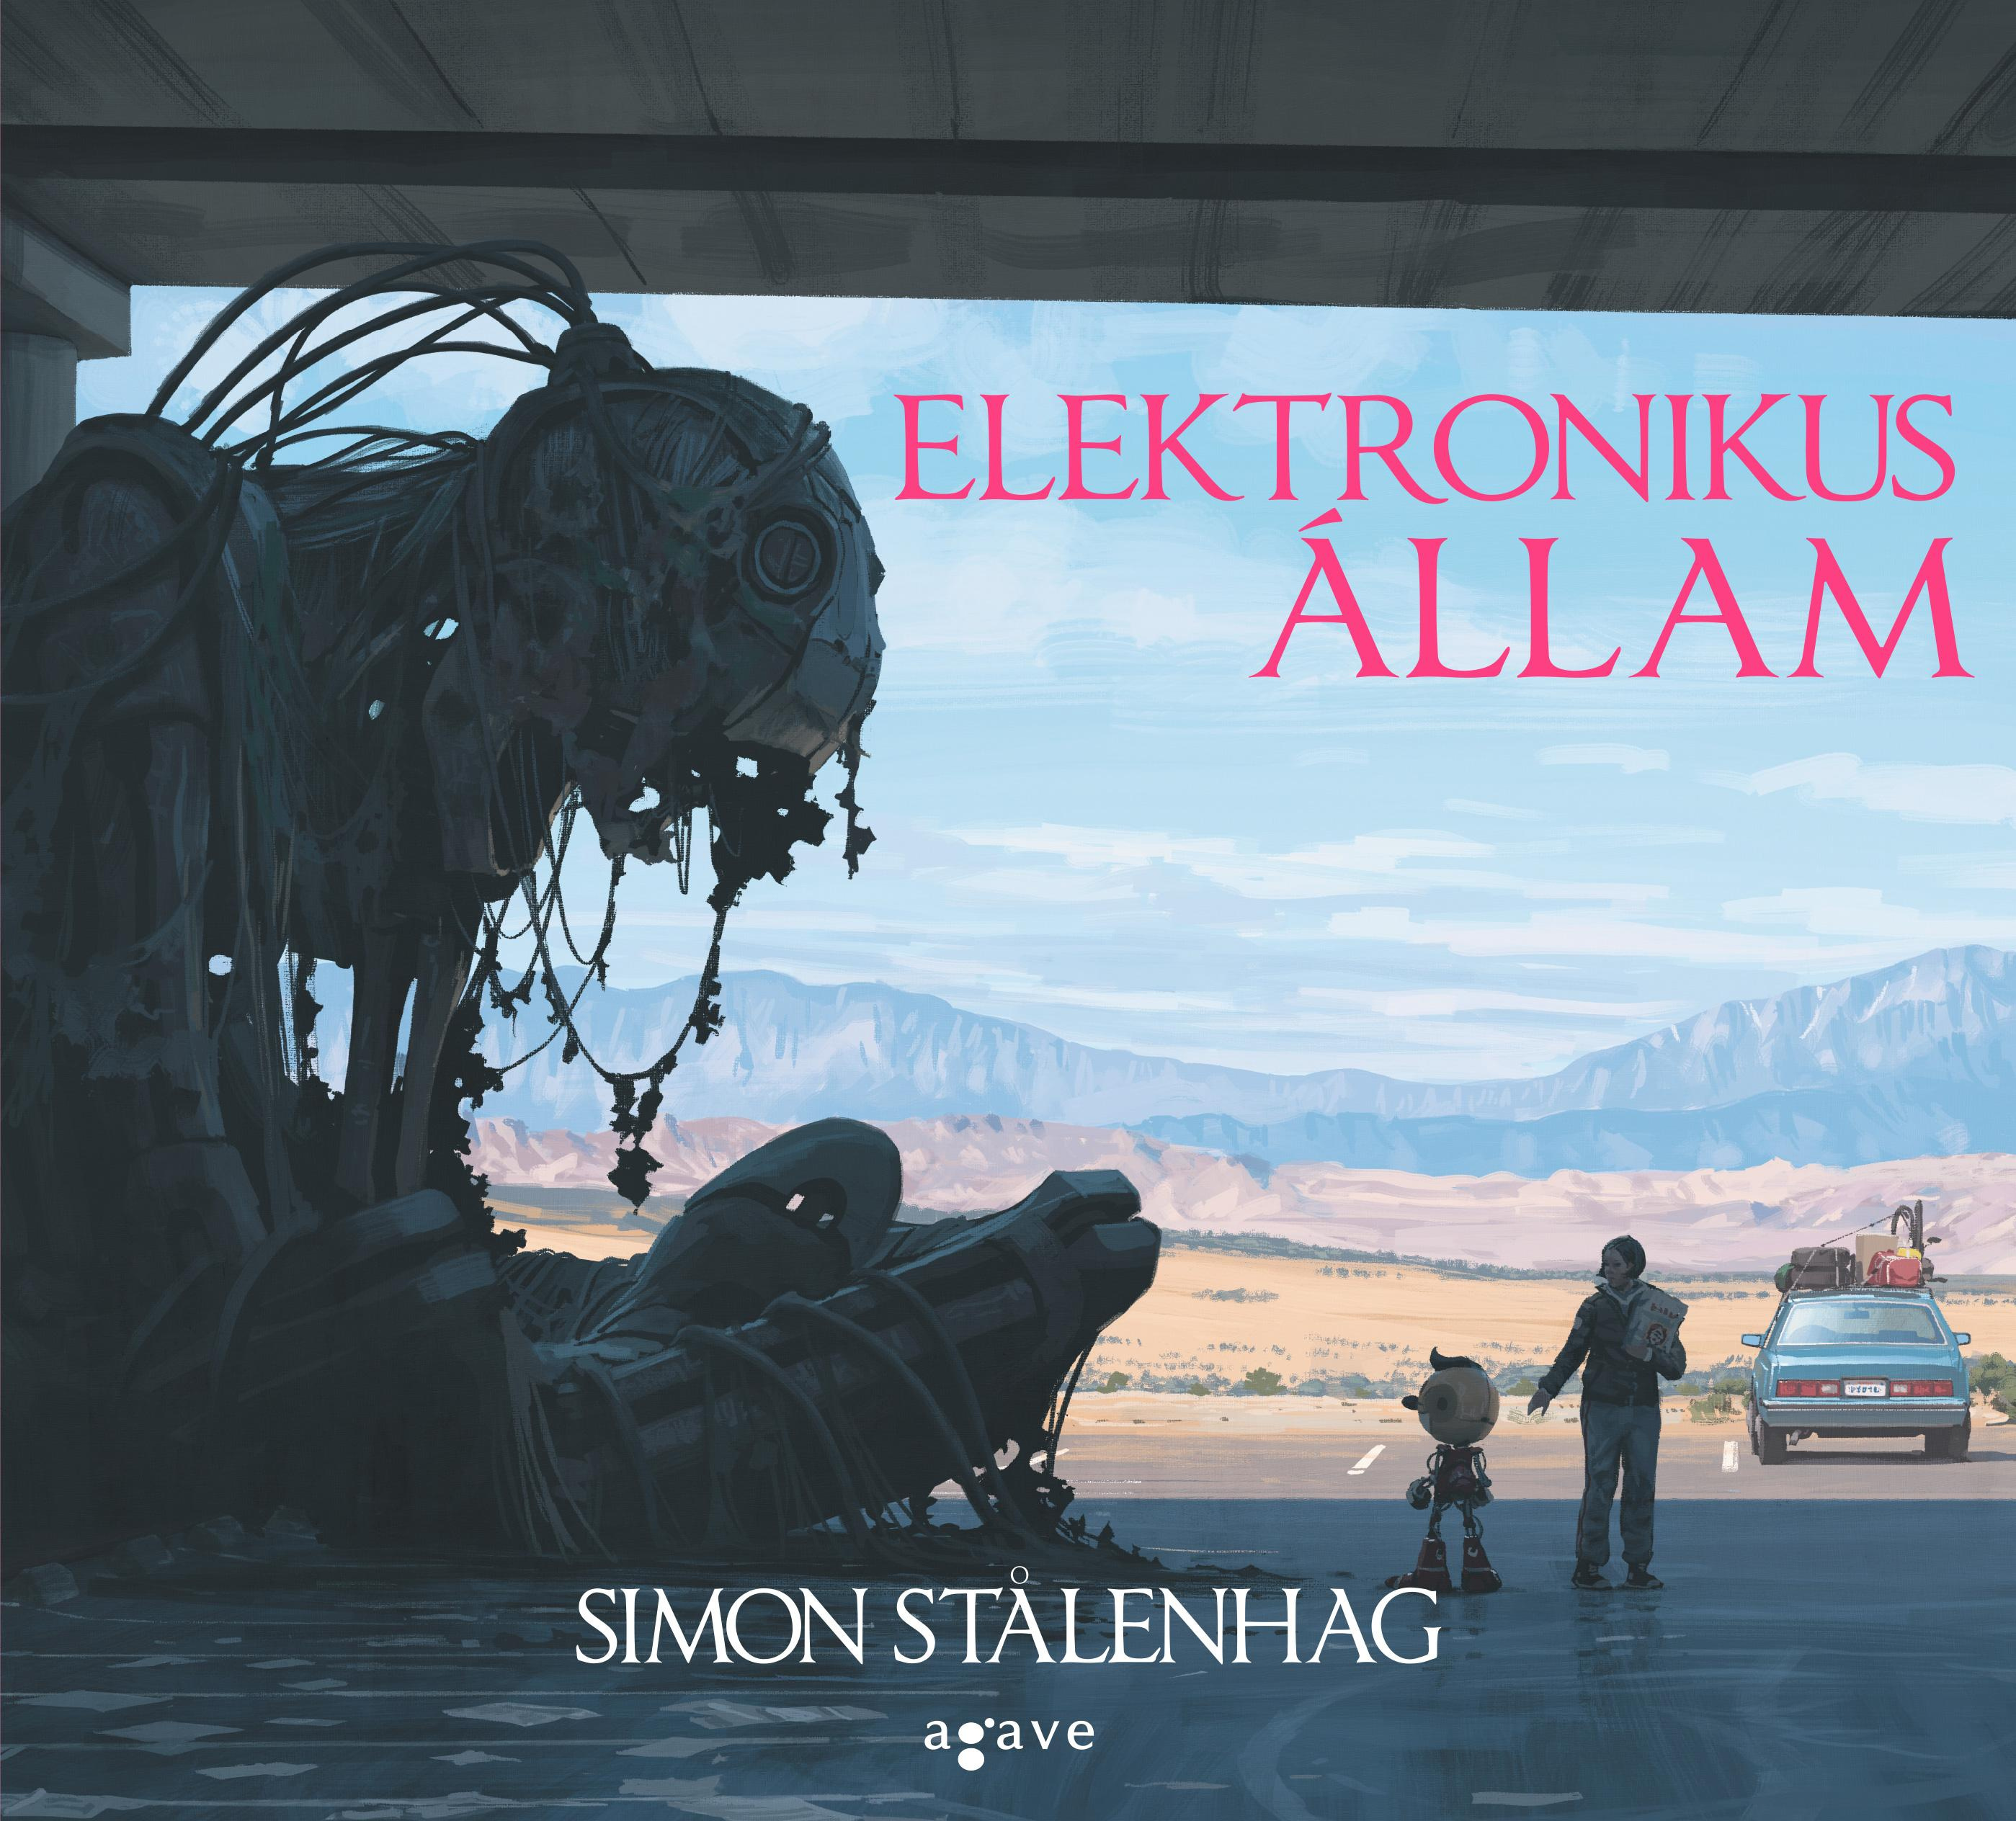 simon_st_lenhag_elektronikus_allam_borito.jpg